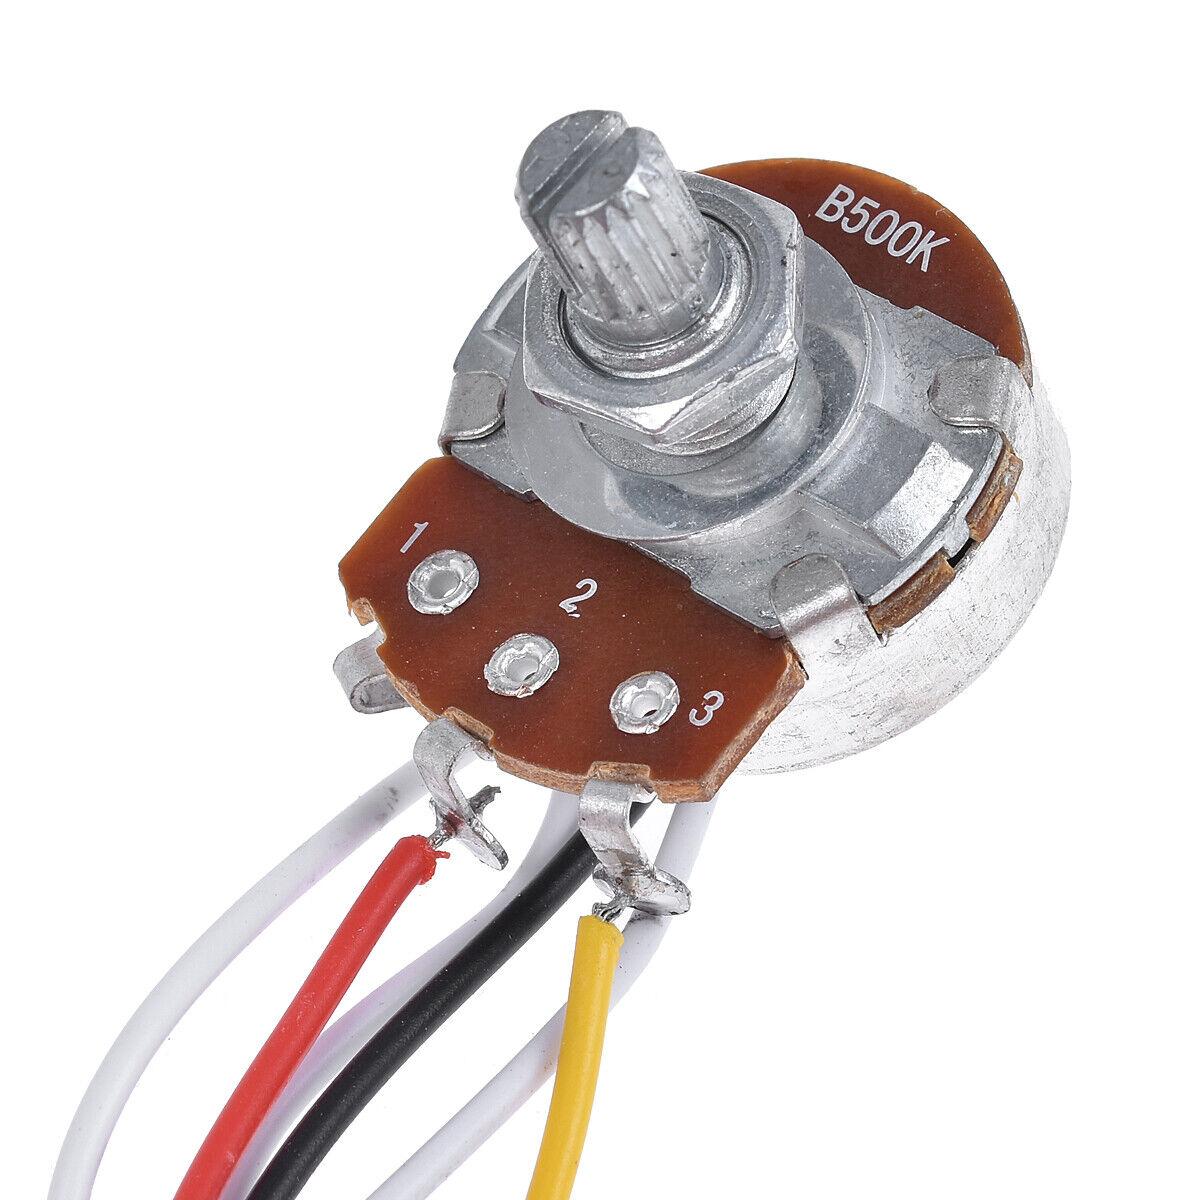 guitar wiring harness kit for strat parts 5 way toggle switch 500k 2t1v 2 pcs 634458683661 ebay. Black Bedroom Furniture Sets. Home Design Ideas